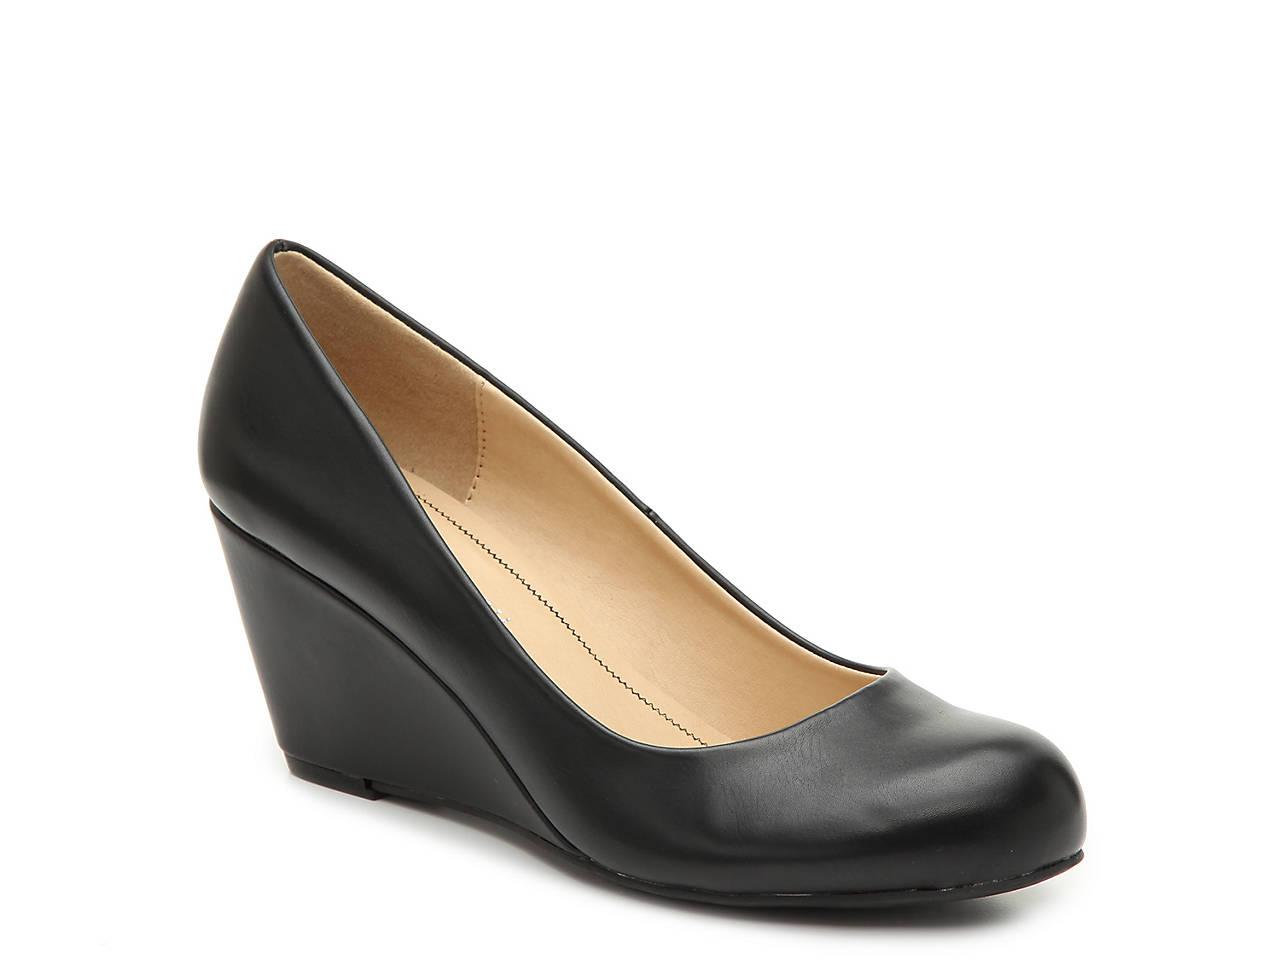 bda416f9b11 CL by Laundry Nima Wedge Pump Women s Shoes